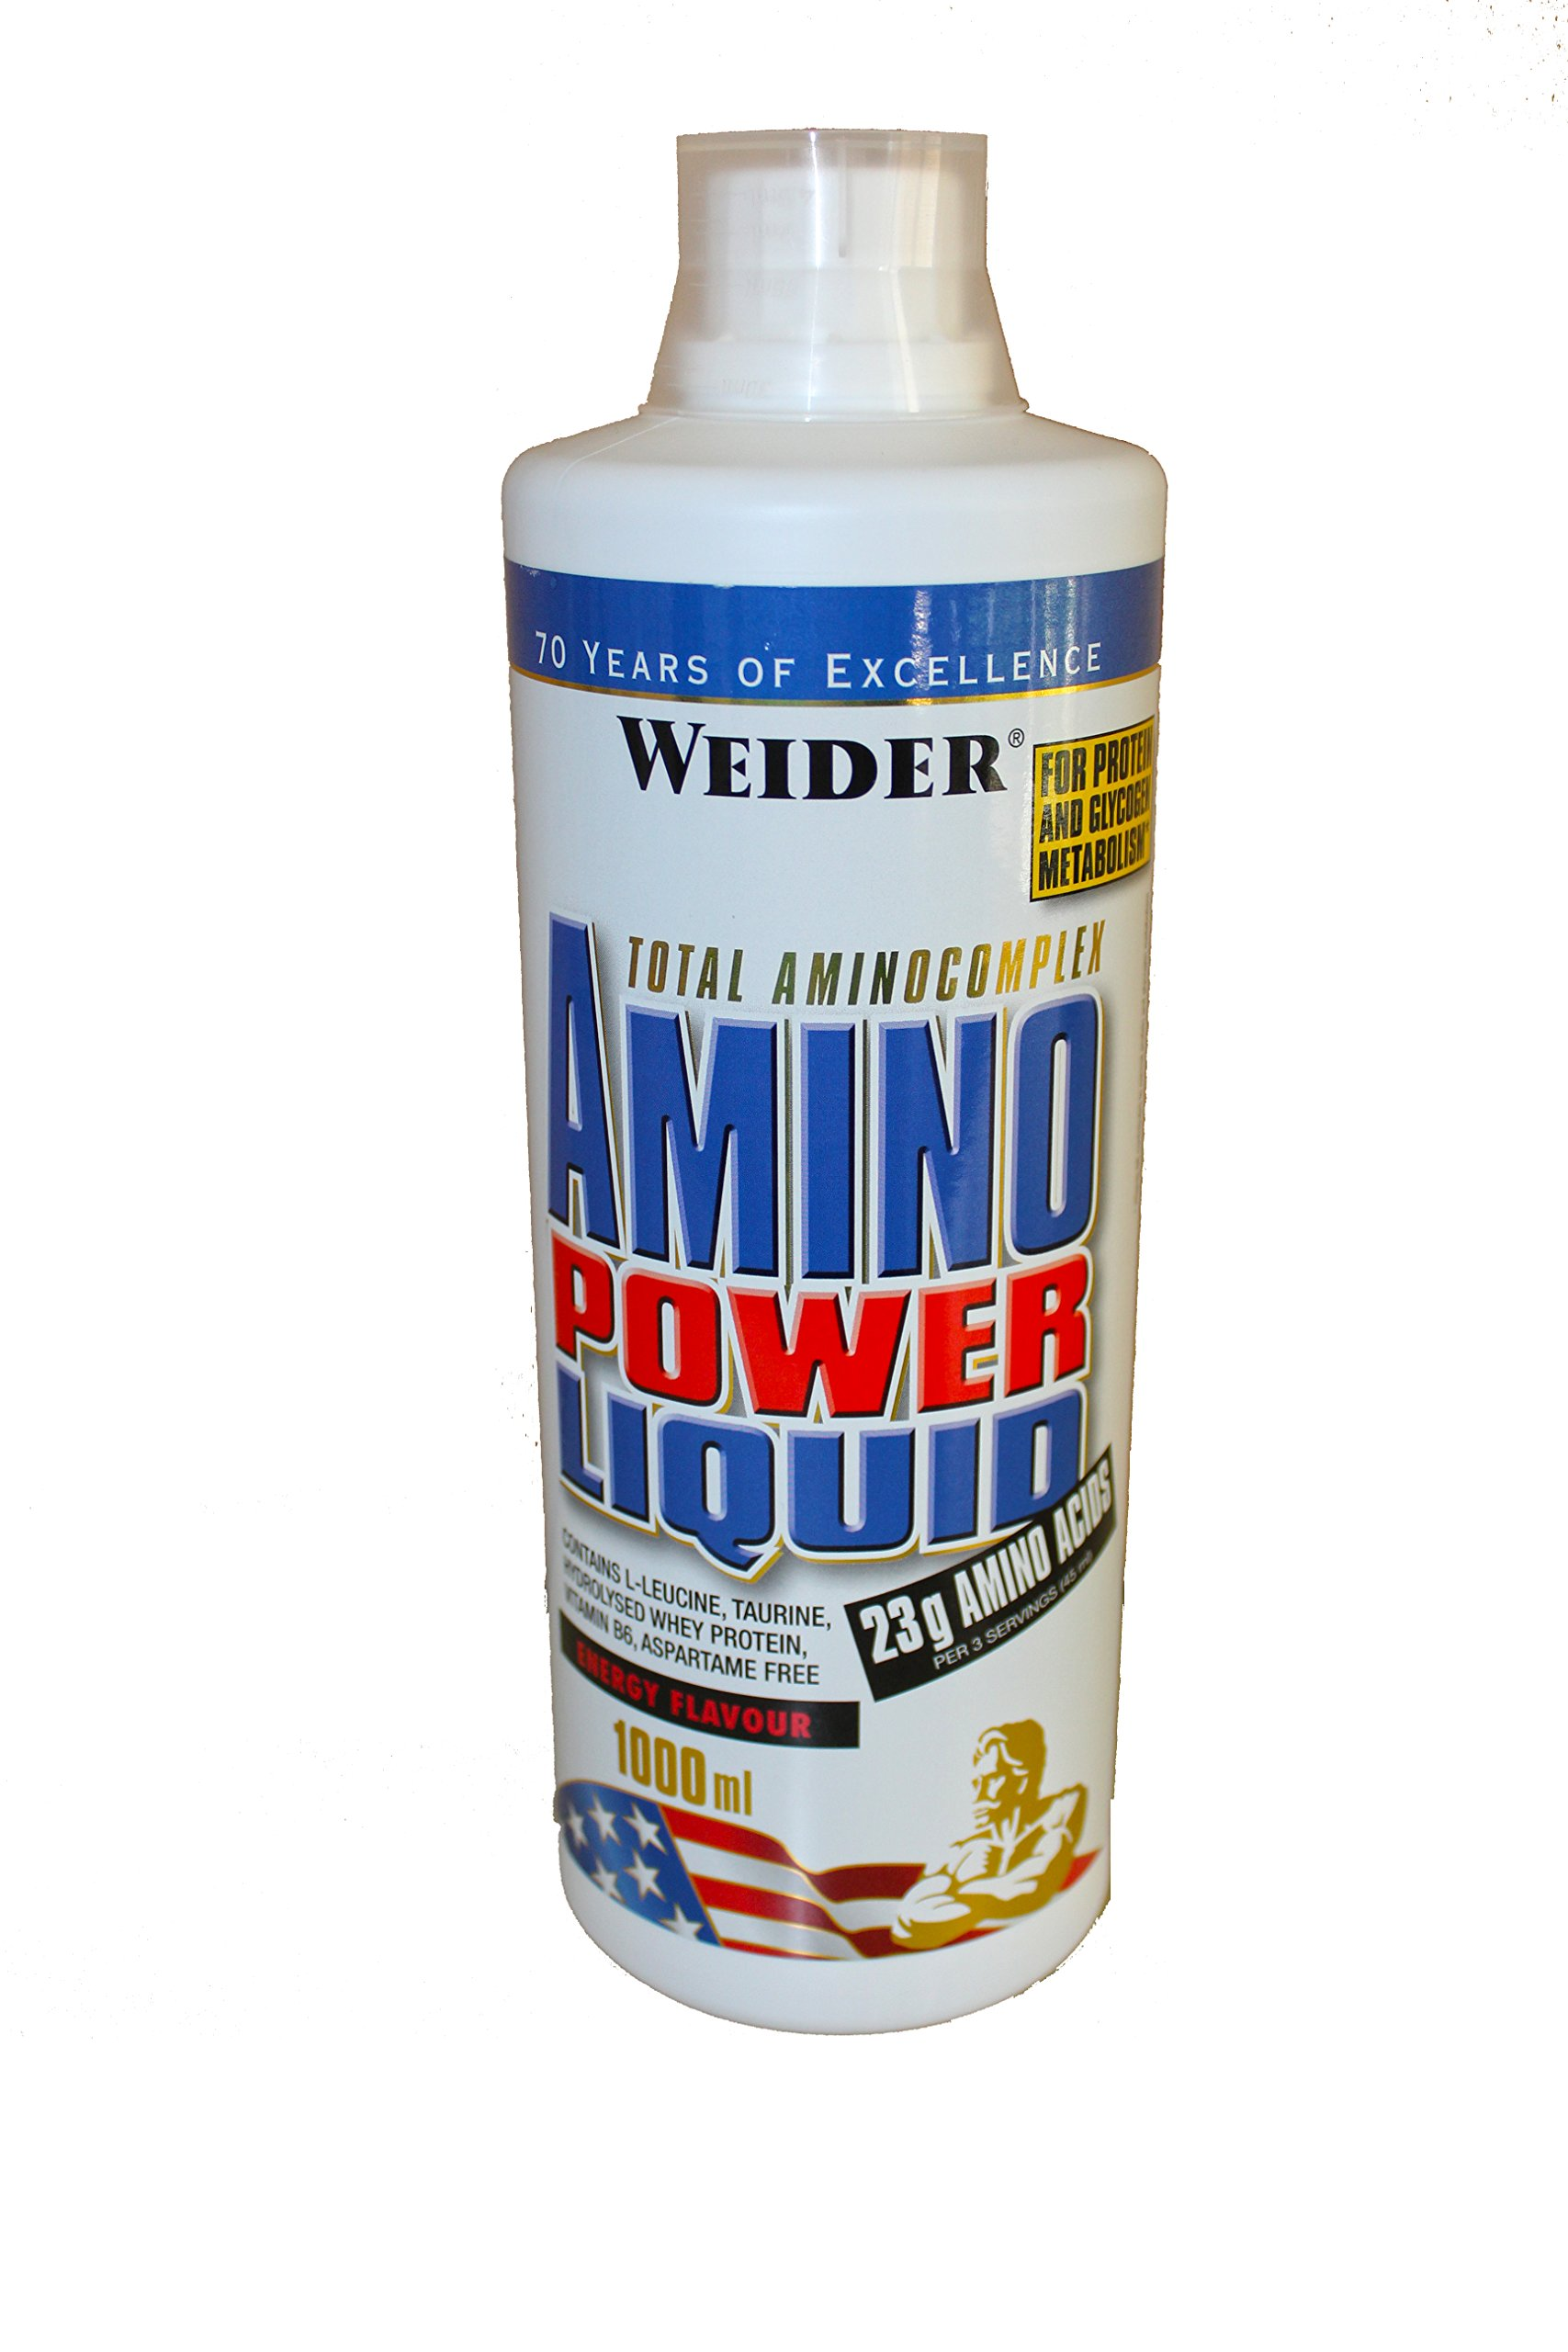 81WxnrvFF7L - Weider Amino Power Liquid 1L Energy, Essential Amino Acids, L-leucine, Free Taurine, Vitamin B8